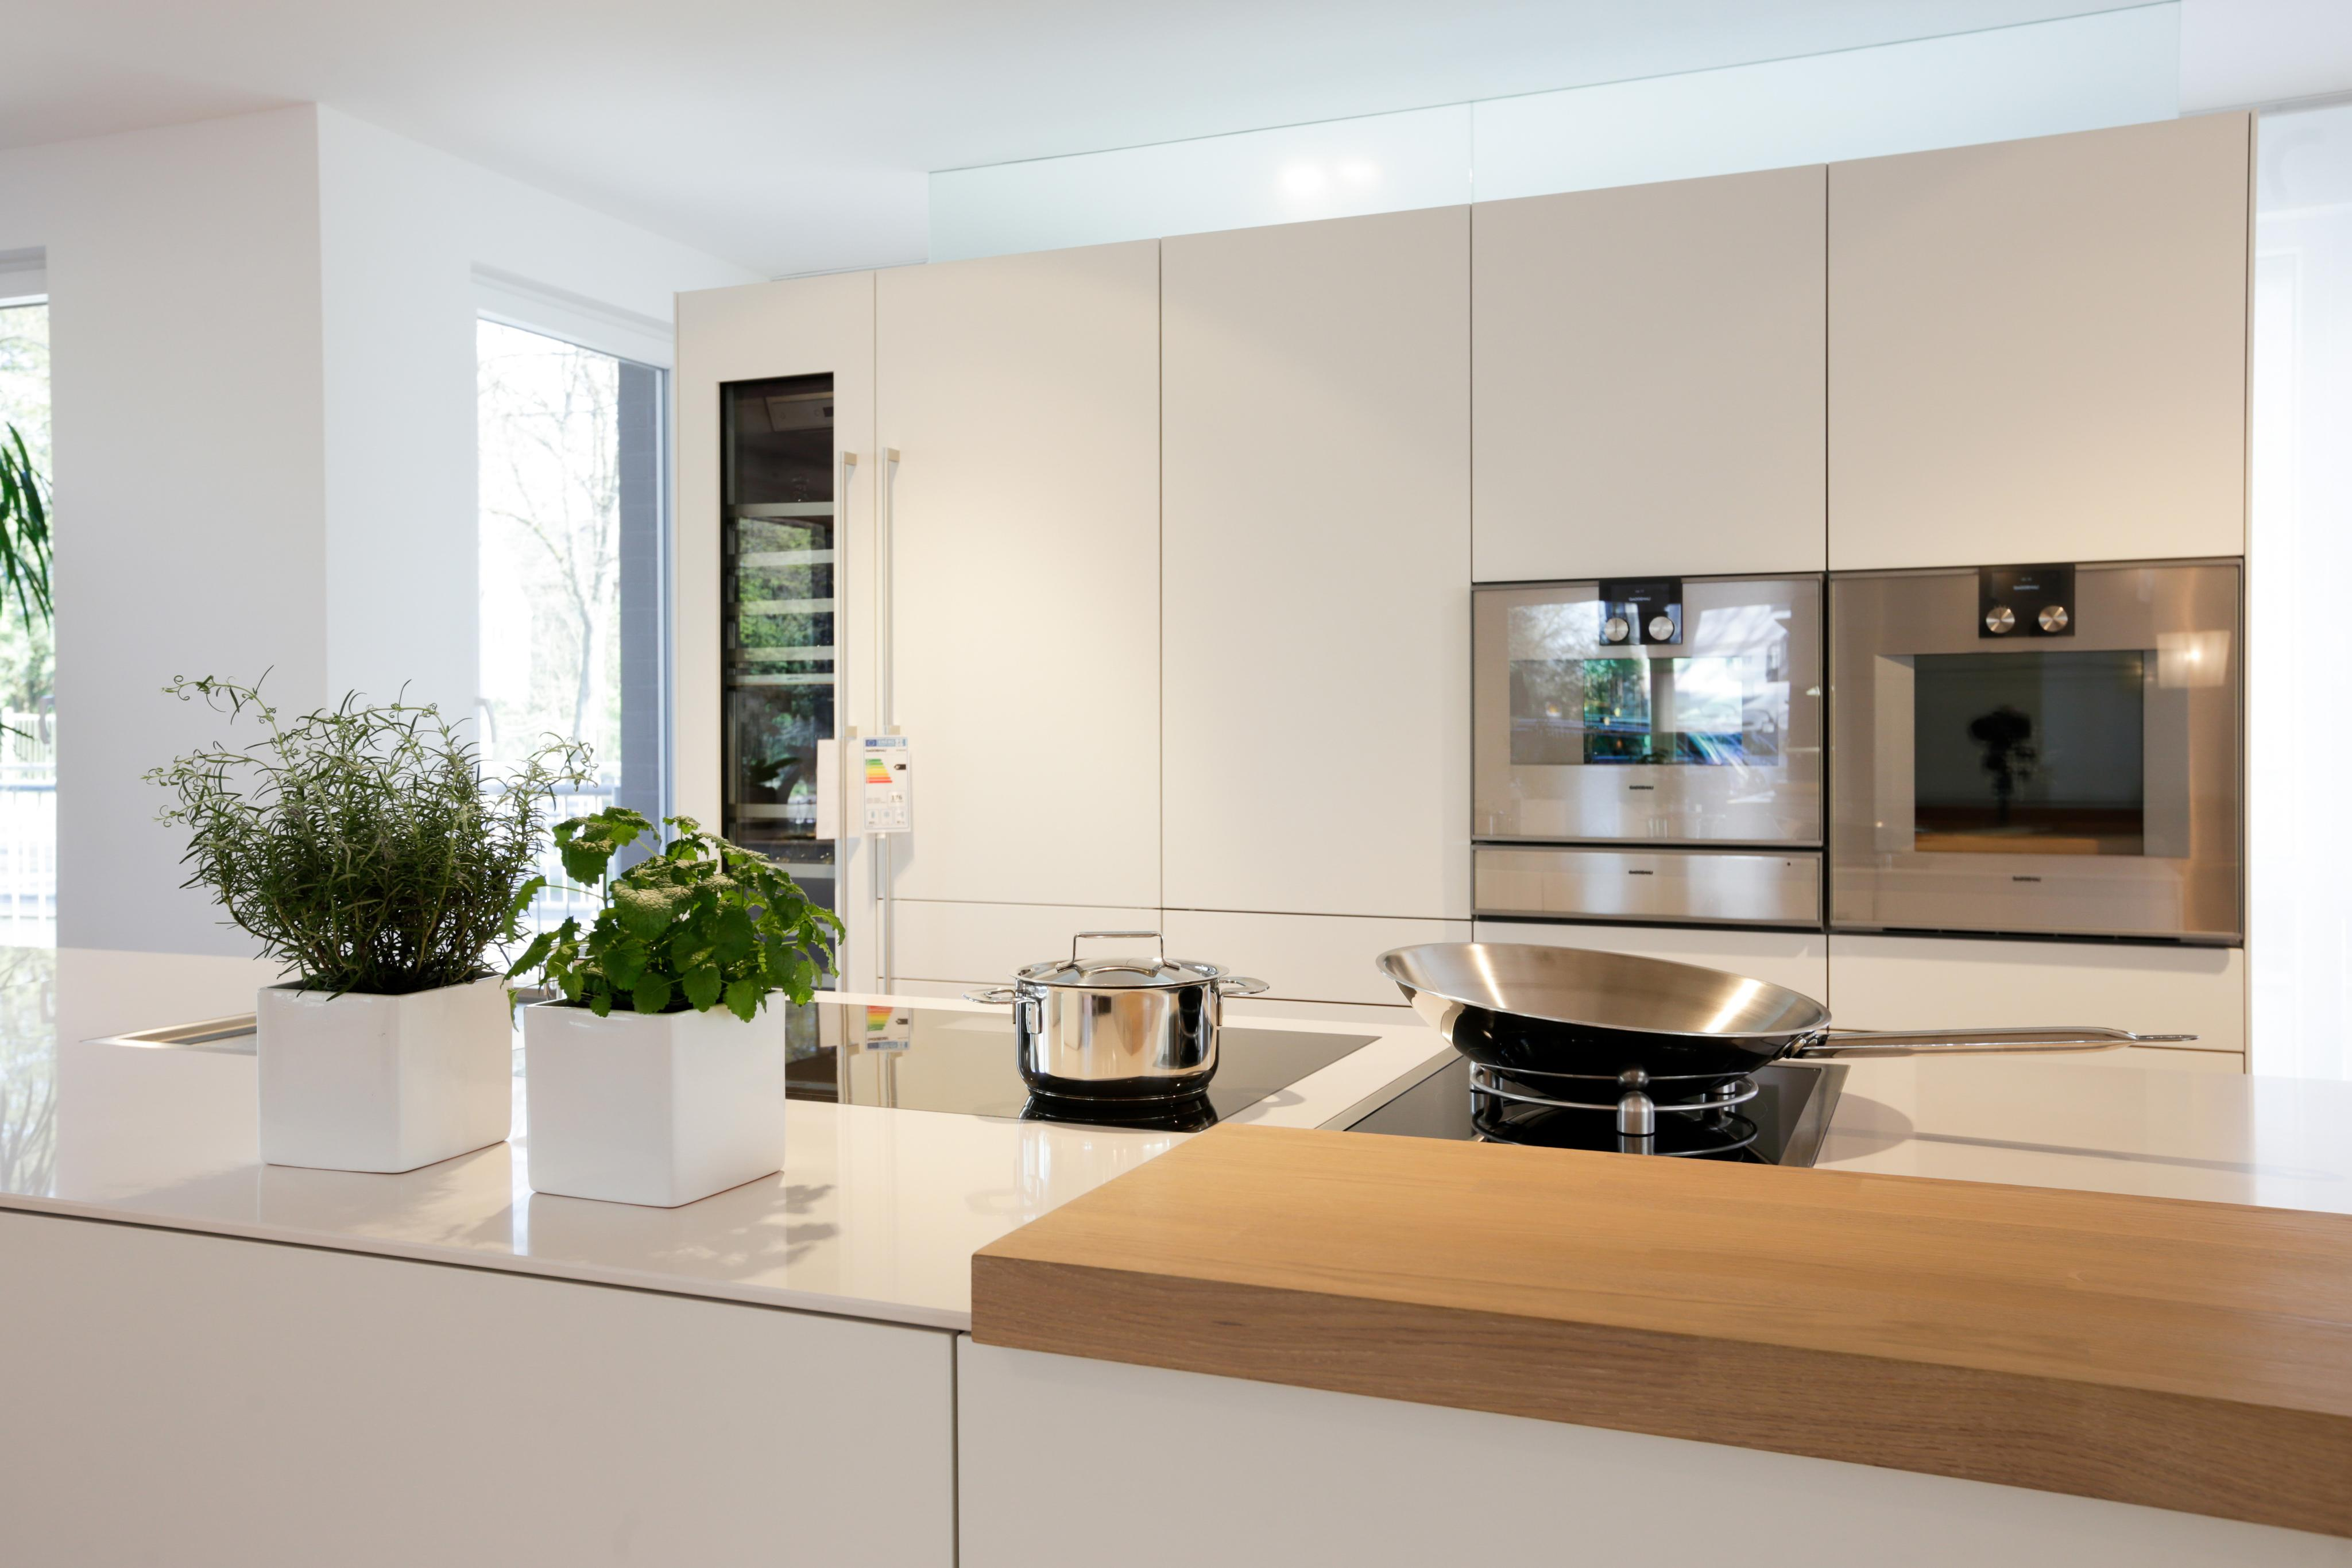 bulthaup Küche b3 #küche ©bulthaup Küche & Feuer Gmb...